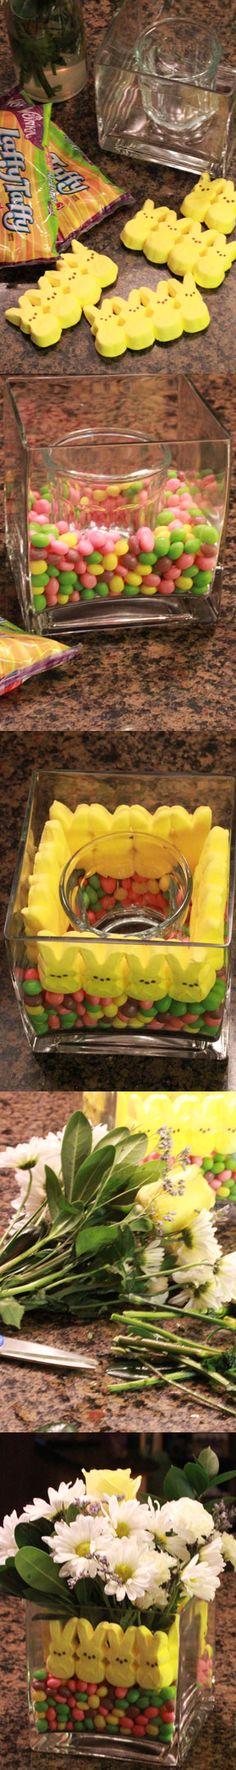 How to create a Peeps centerpiece #DIY #Easter #Peeps